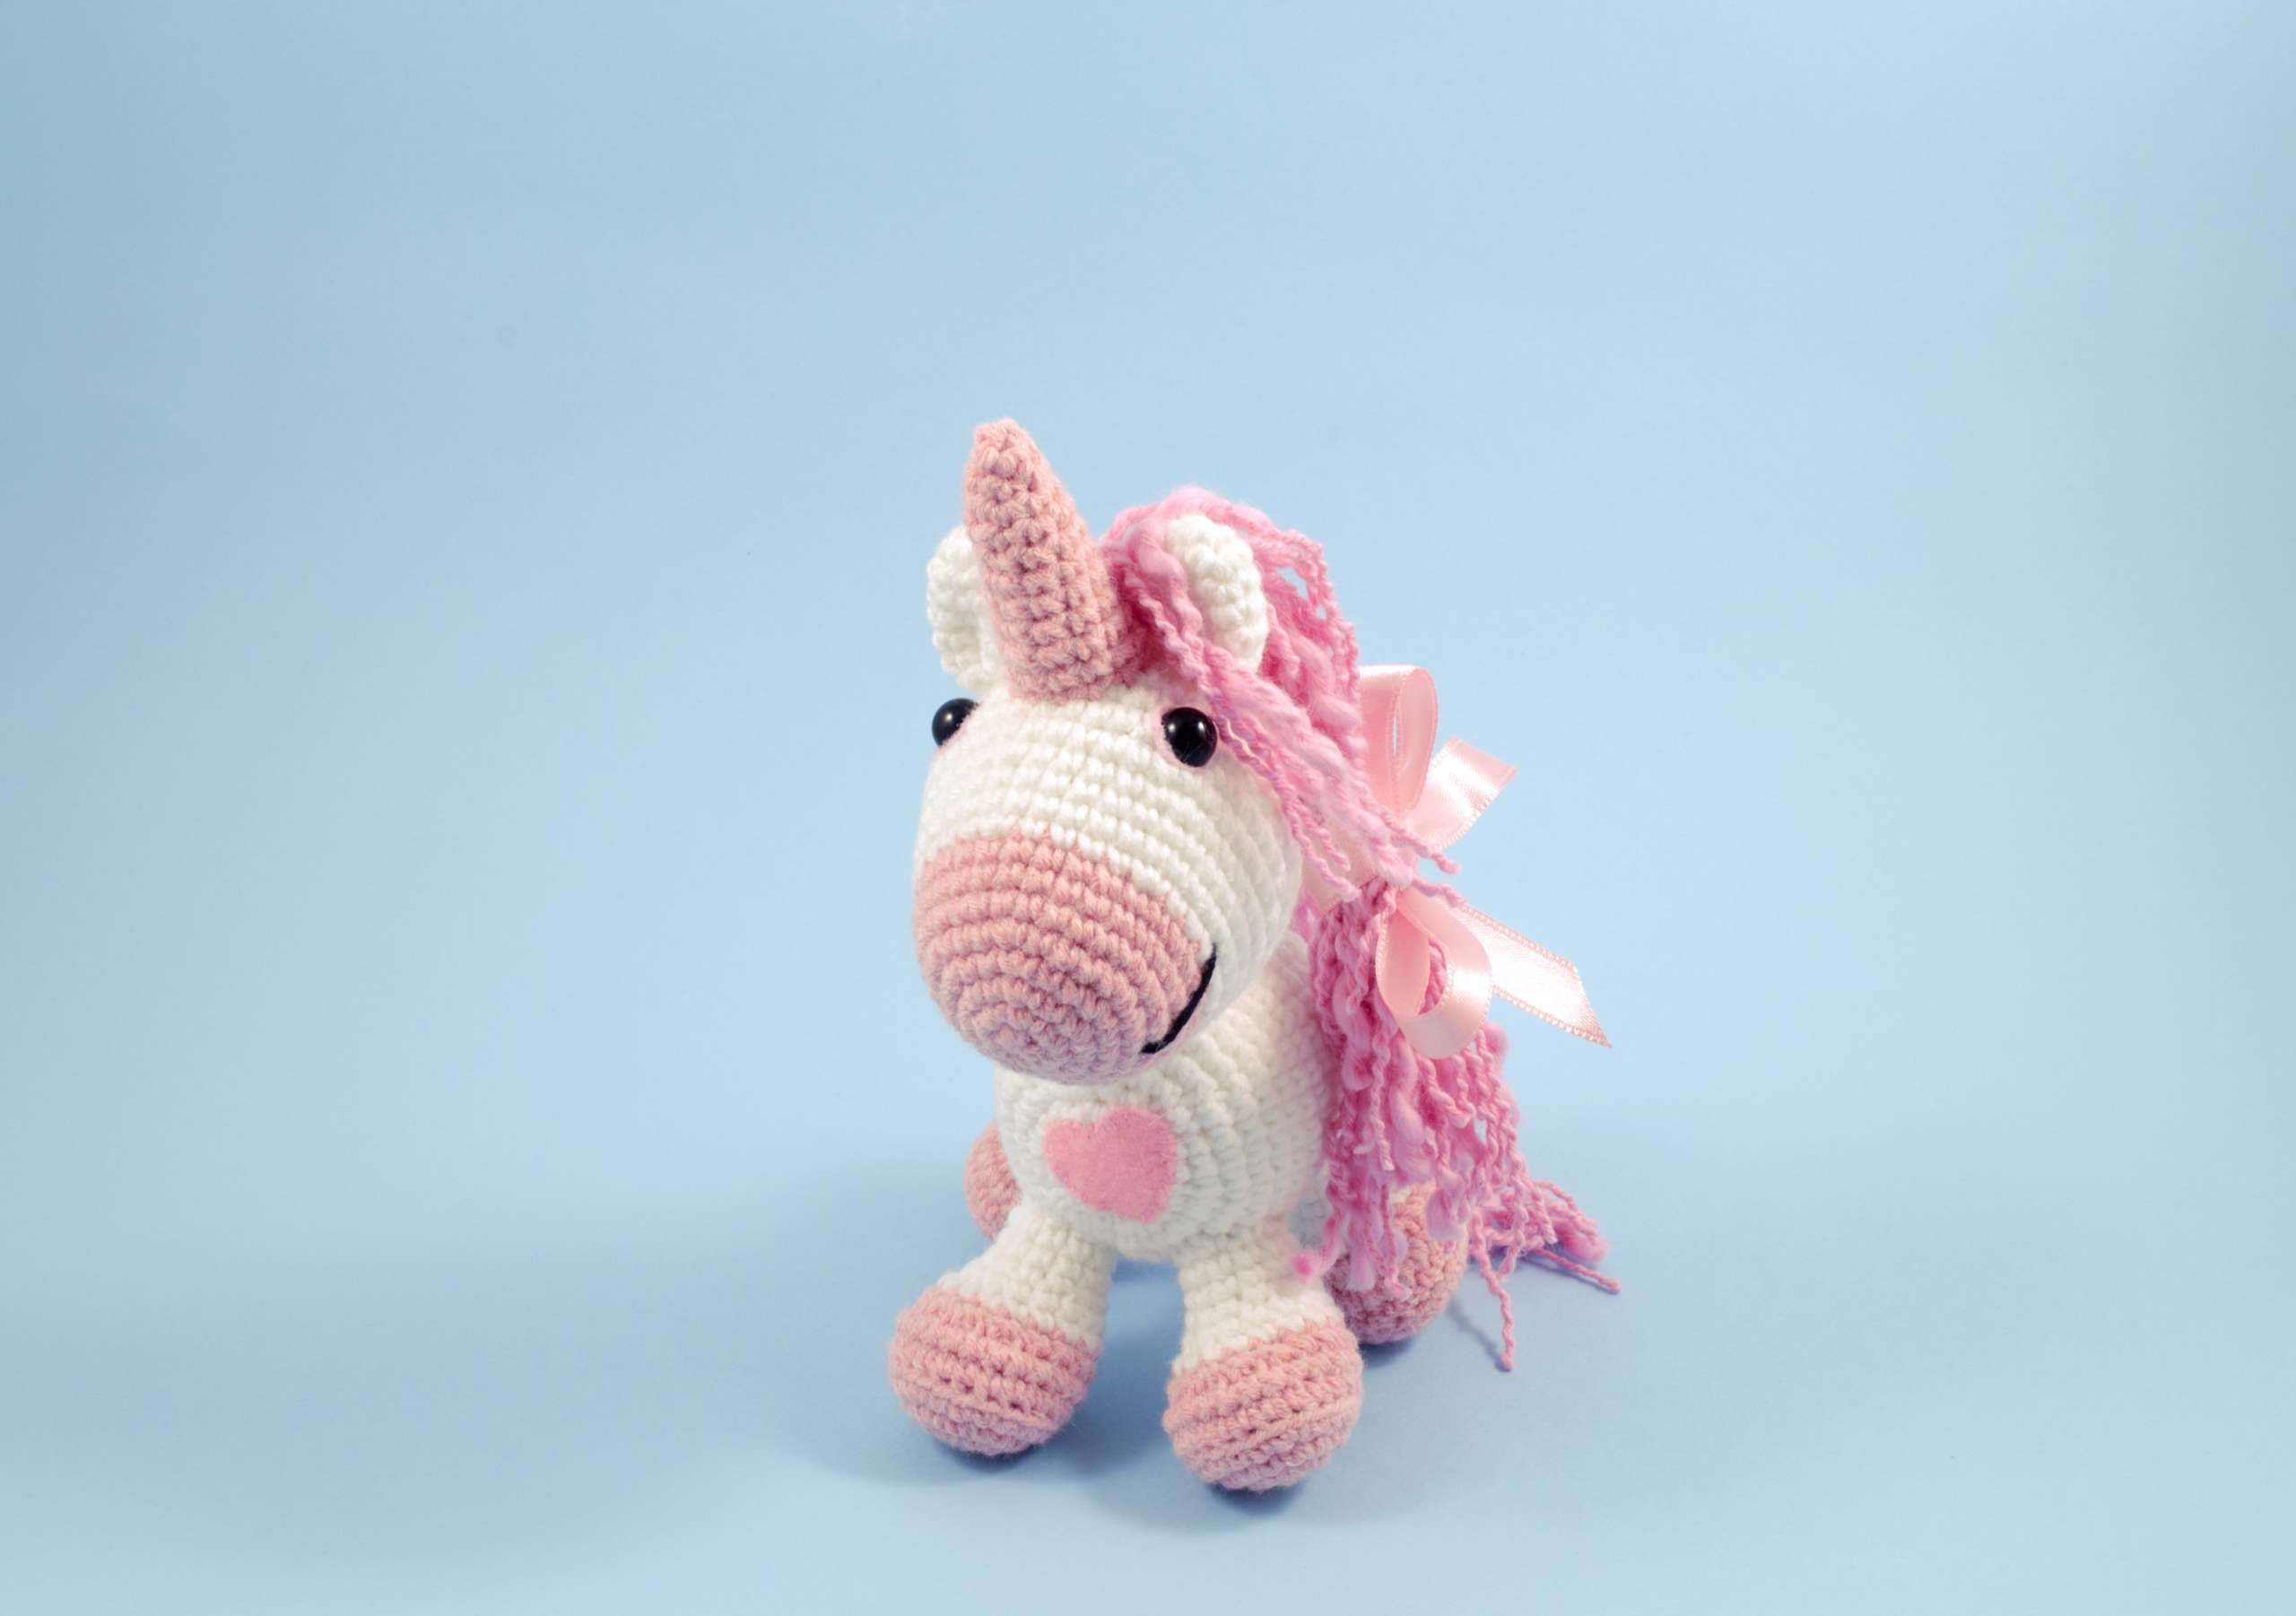 crochet pink unicorn front view